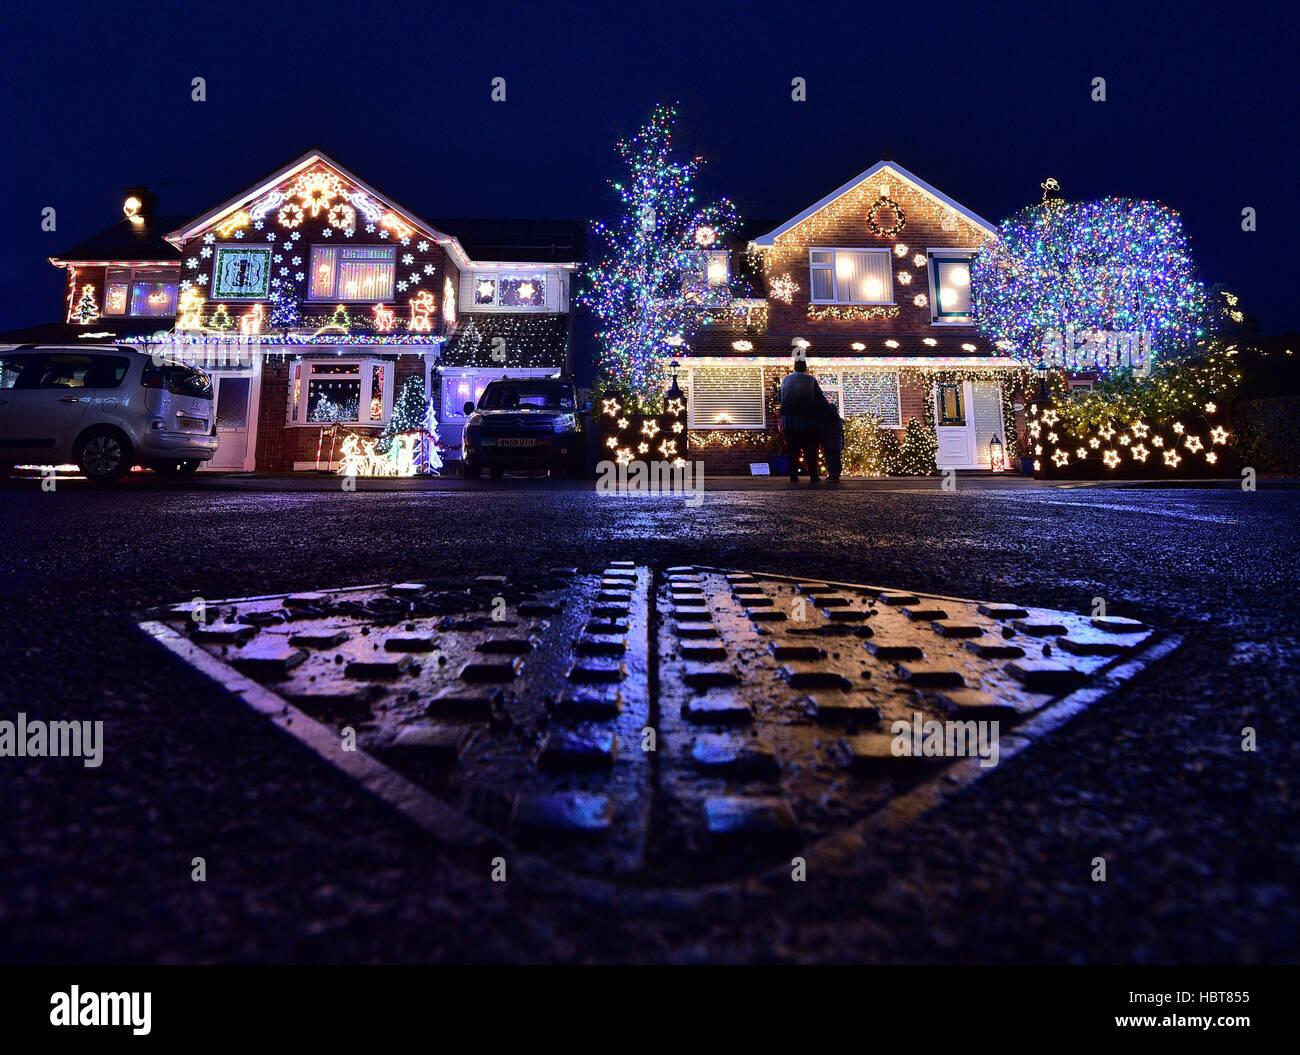 Christmas Lights On Houses.People Admire Christmas Lights On Houses On Trinity Close In